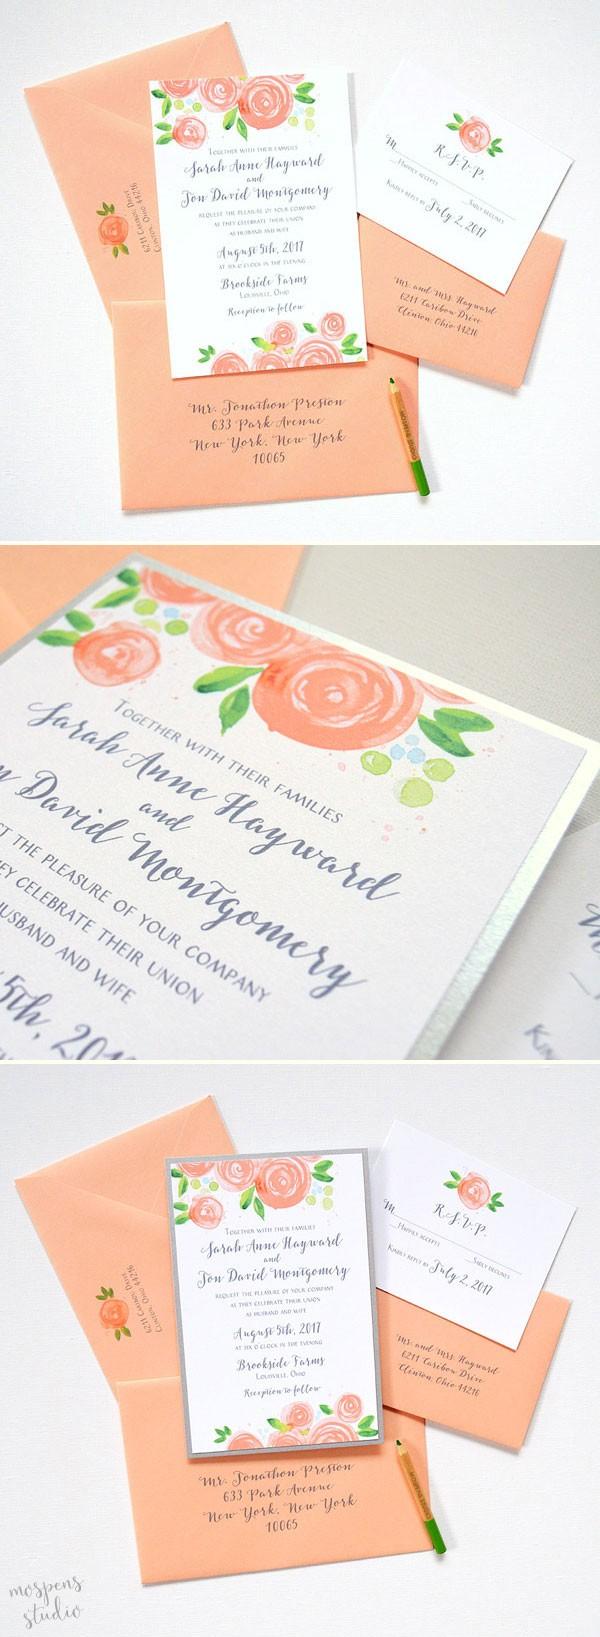 Handmade Watercolor Hydrangea Invitation Suite